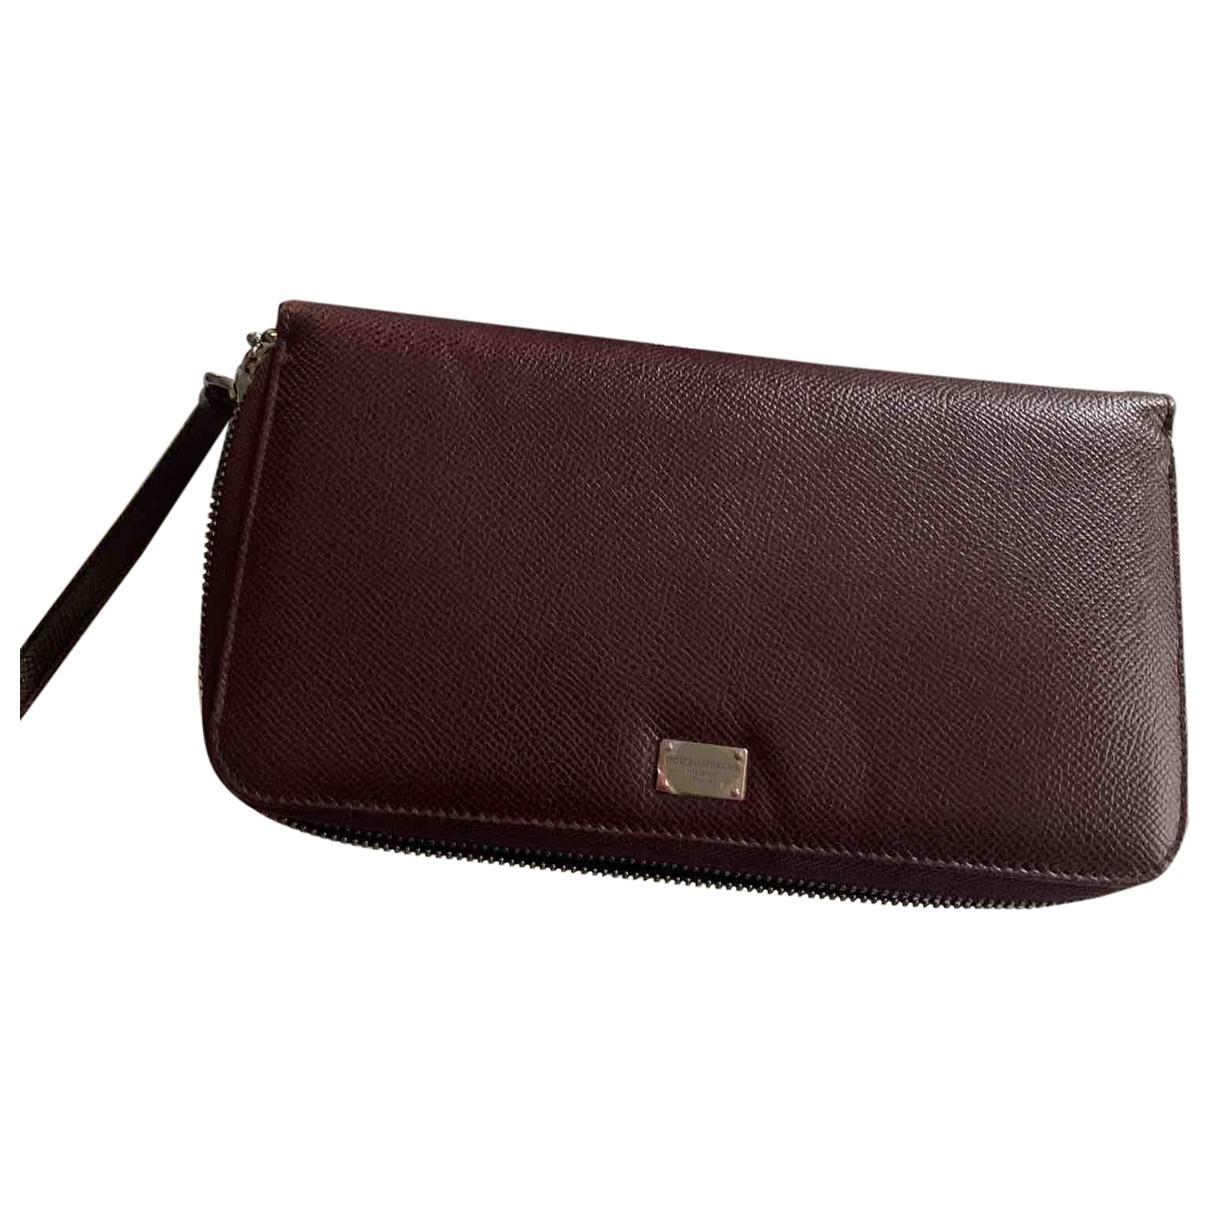 Dolce & Gabbana \N Burgundy Leather wallet for Women \N